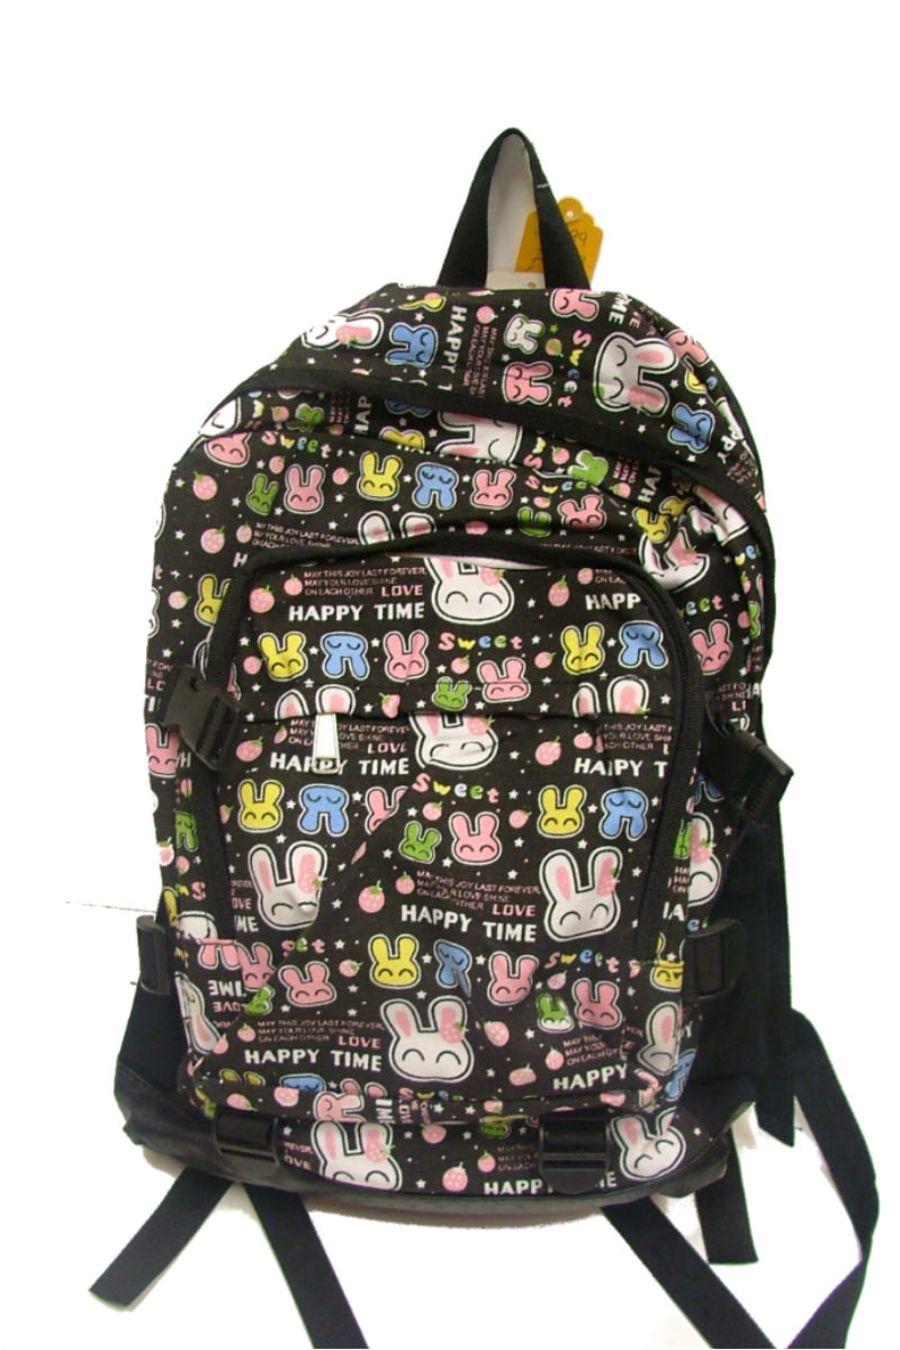 Happy Bunny Skater Rucksack Bag